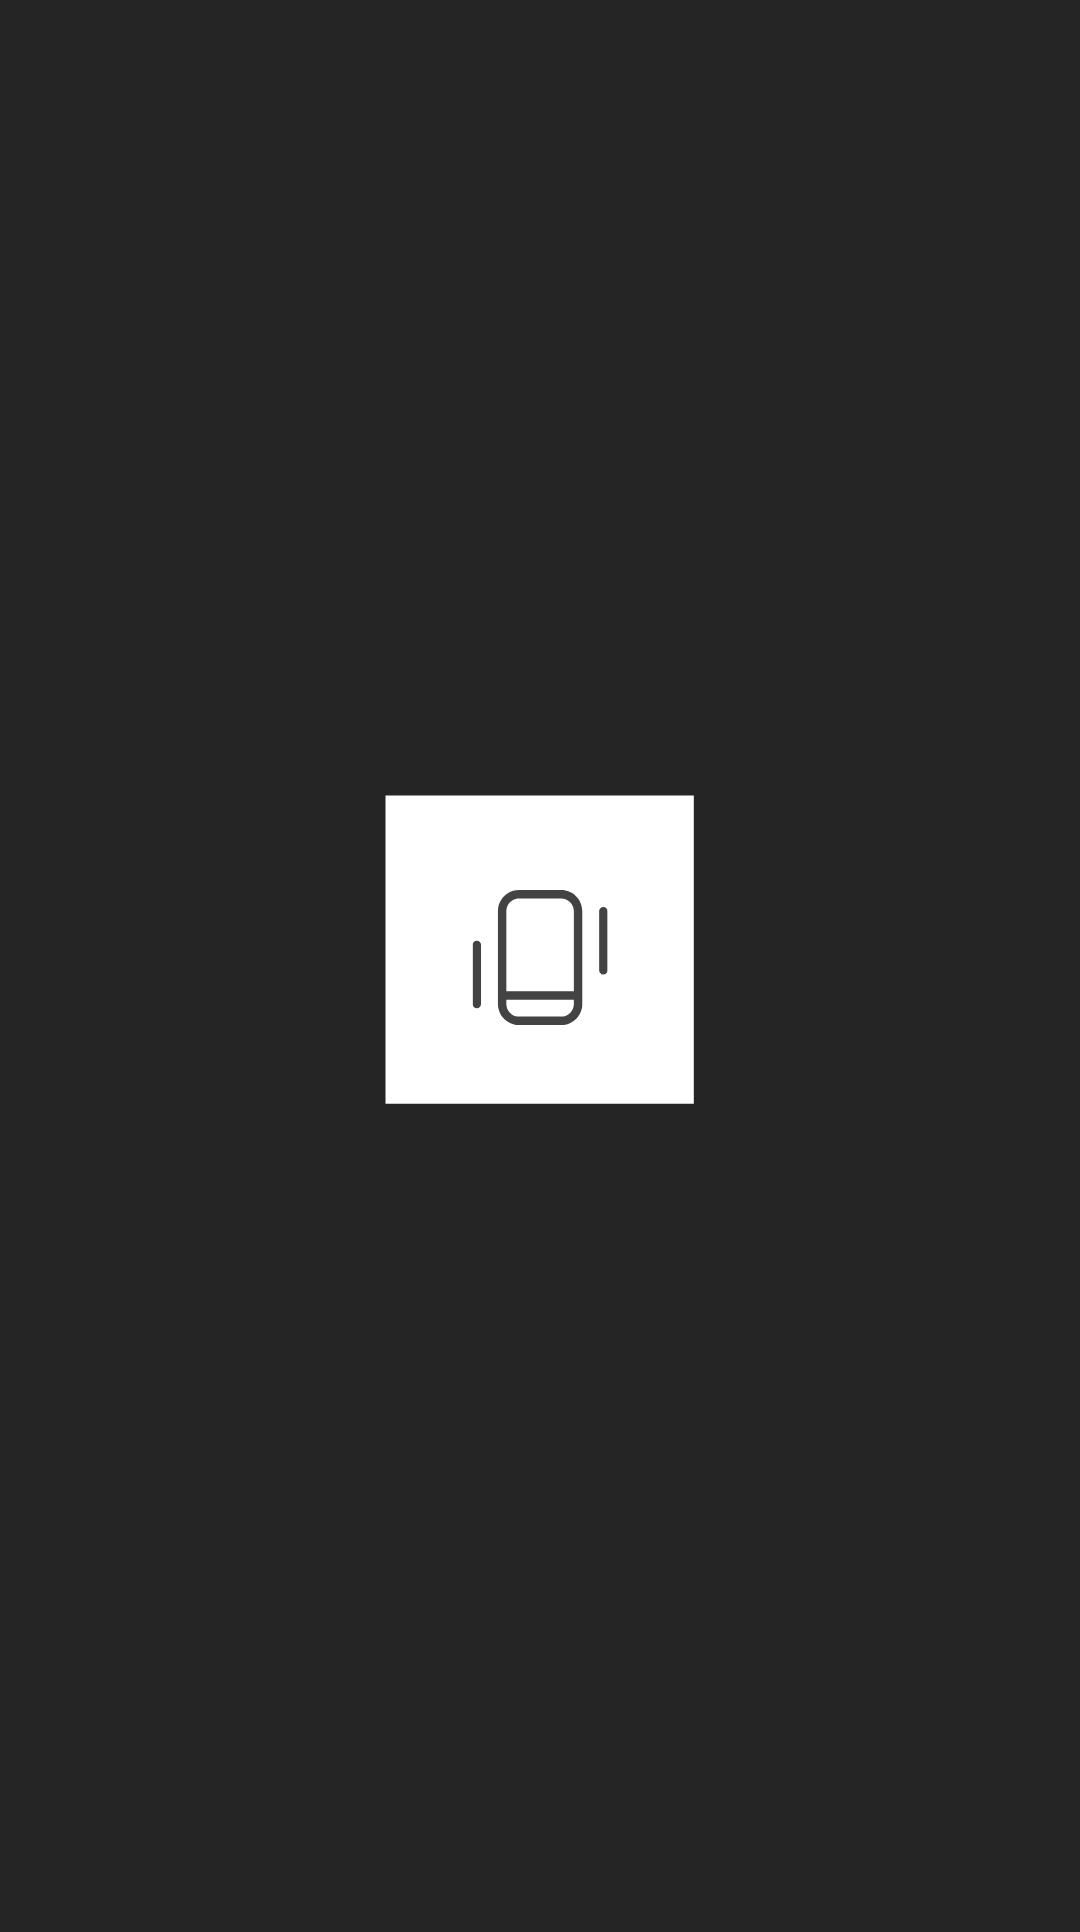 Black and White Instagram Story Highlight Cover 12.jpe